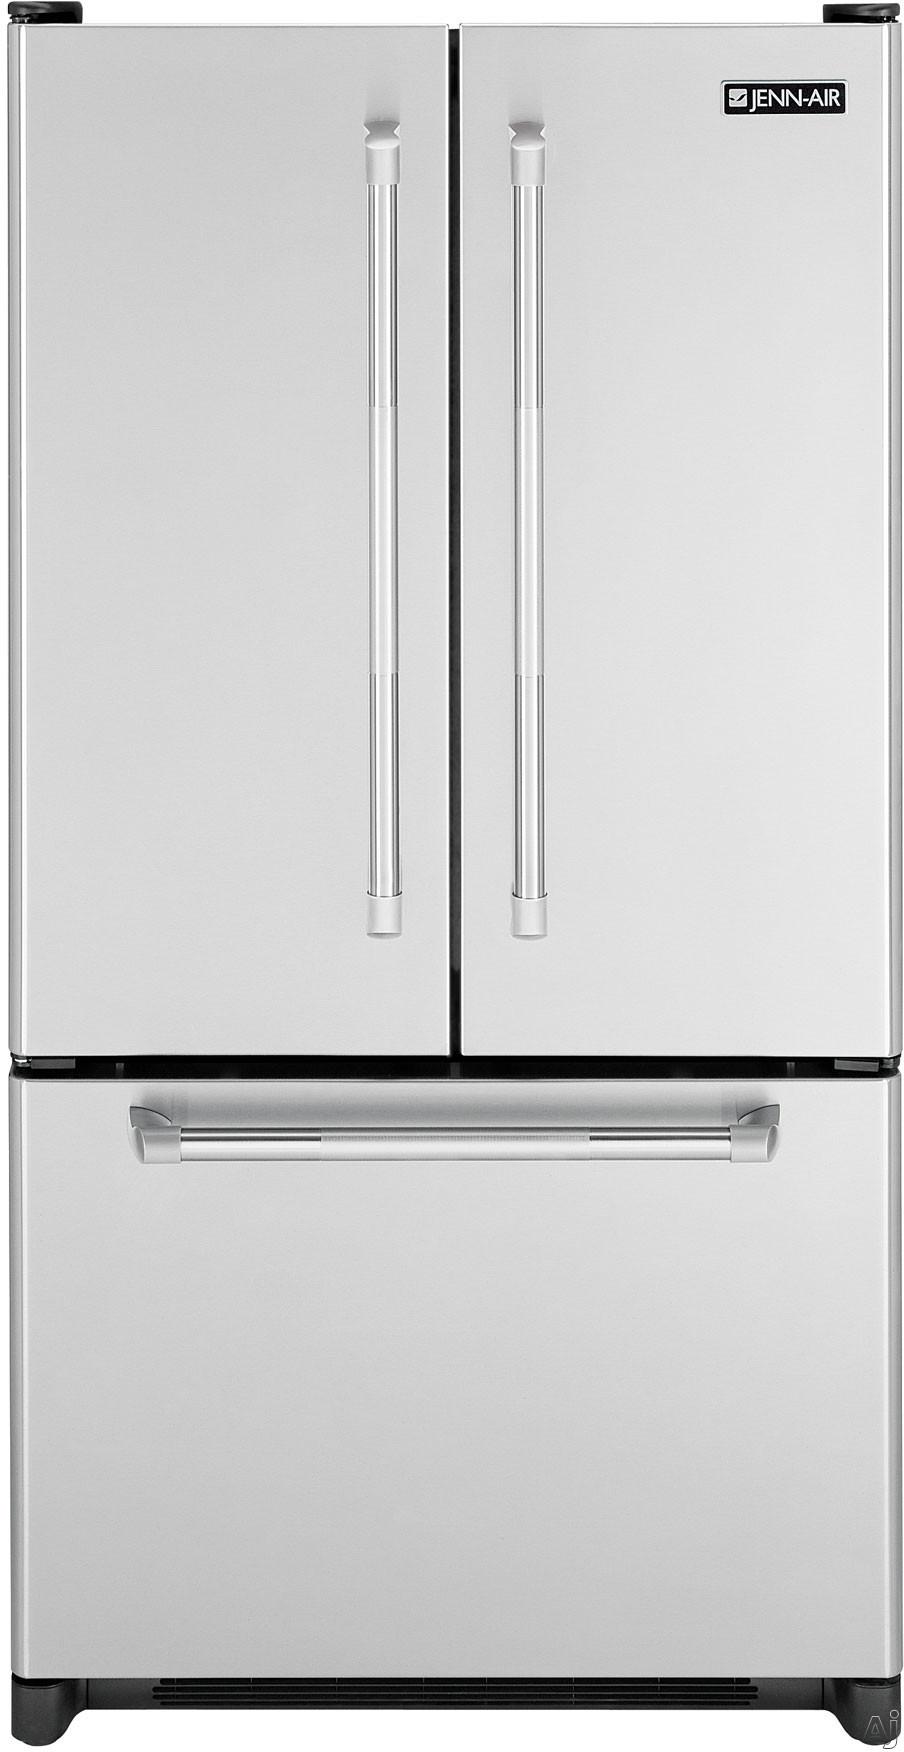 Photos Of 42 Inch Counter Depth French Door Refrigerator